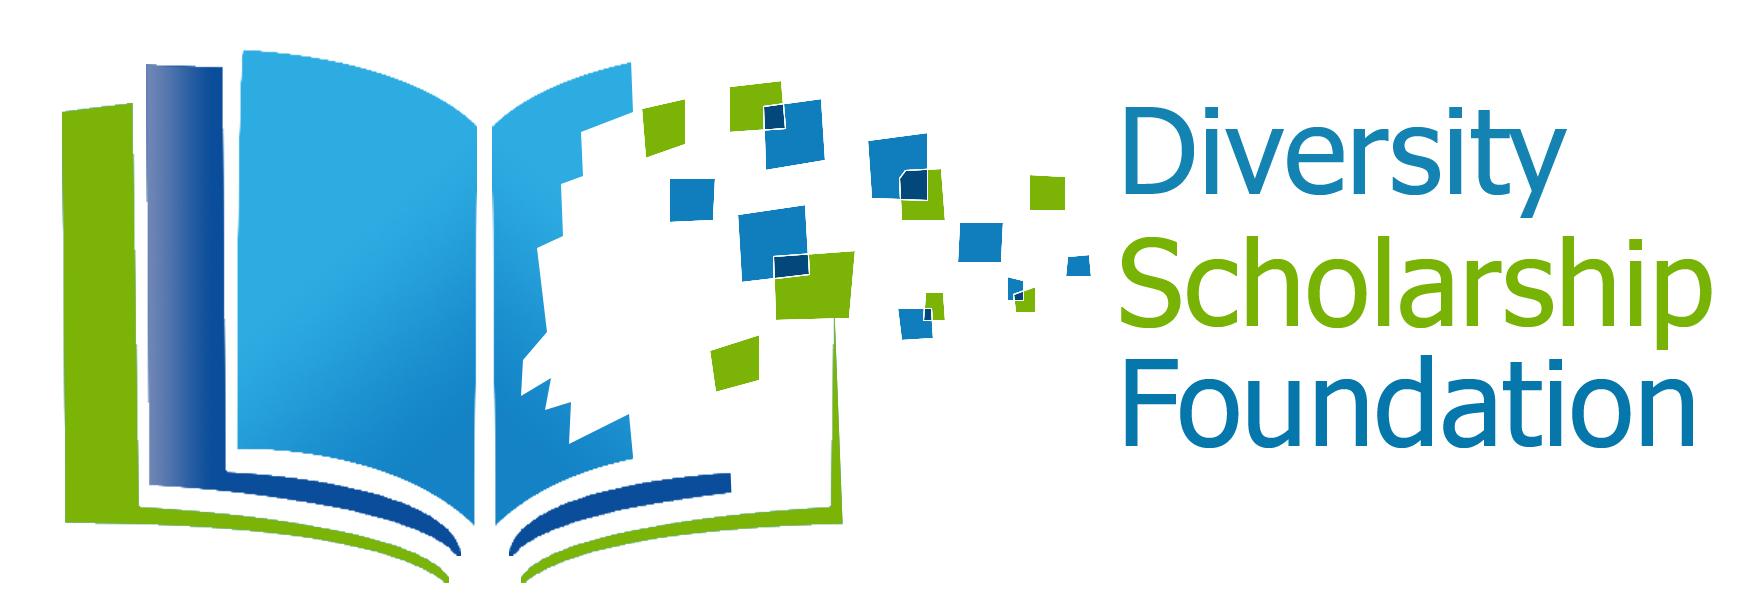 Diversity Scholarship Foundation